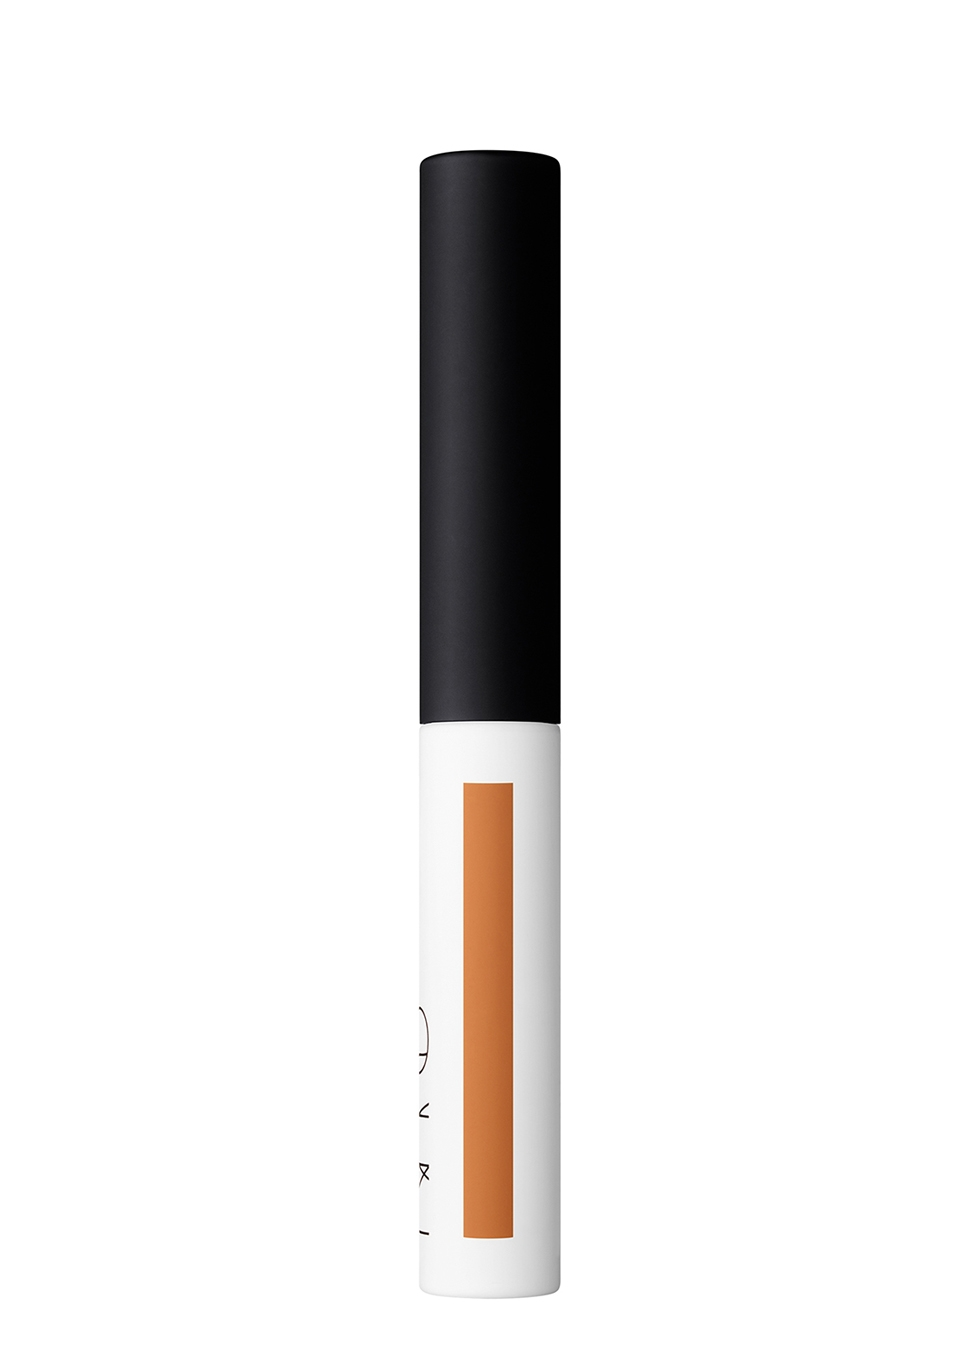 Tinted Smudge Proof Eyeshadow Base - NARS